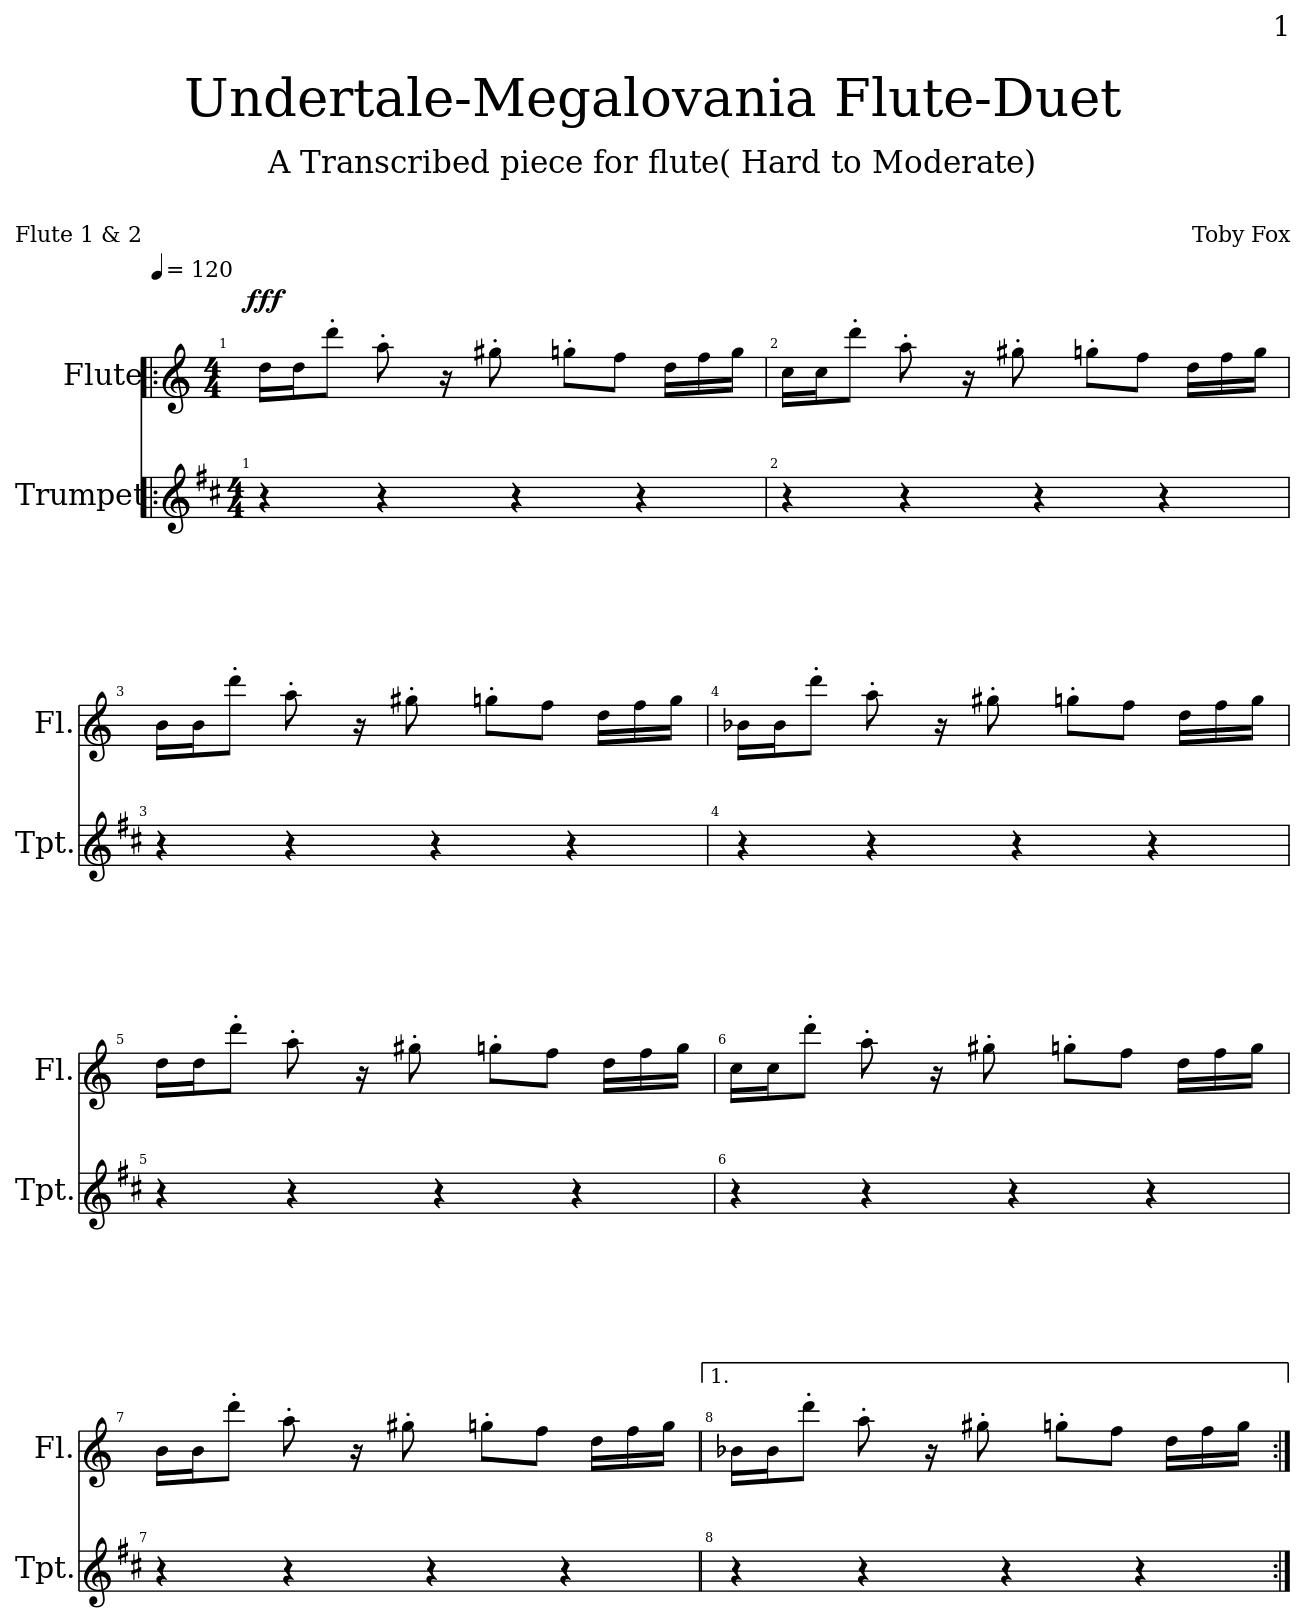 Grenade Flute Sheet Music With Lyrics: Undertale-Megalovania Flute-Duet, A Music Score By Phenx